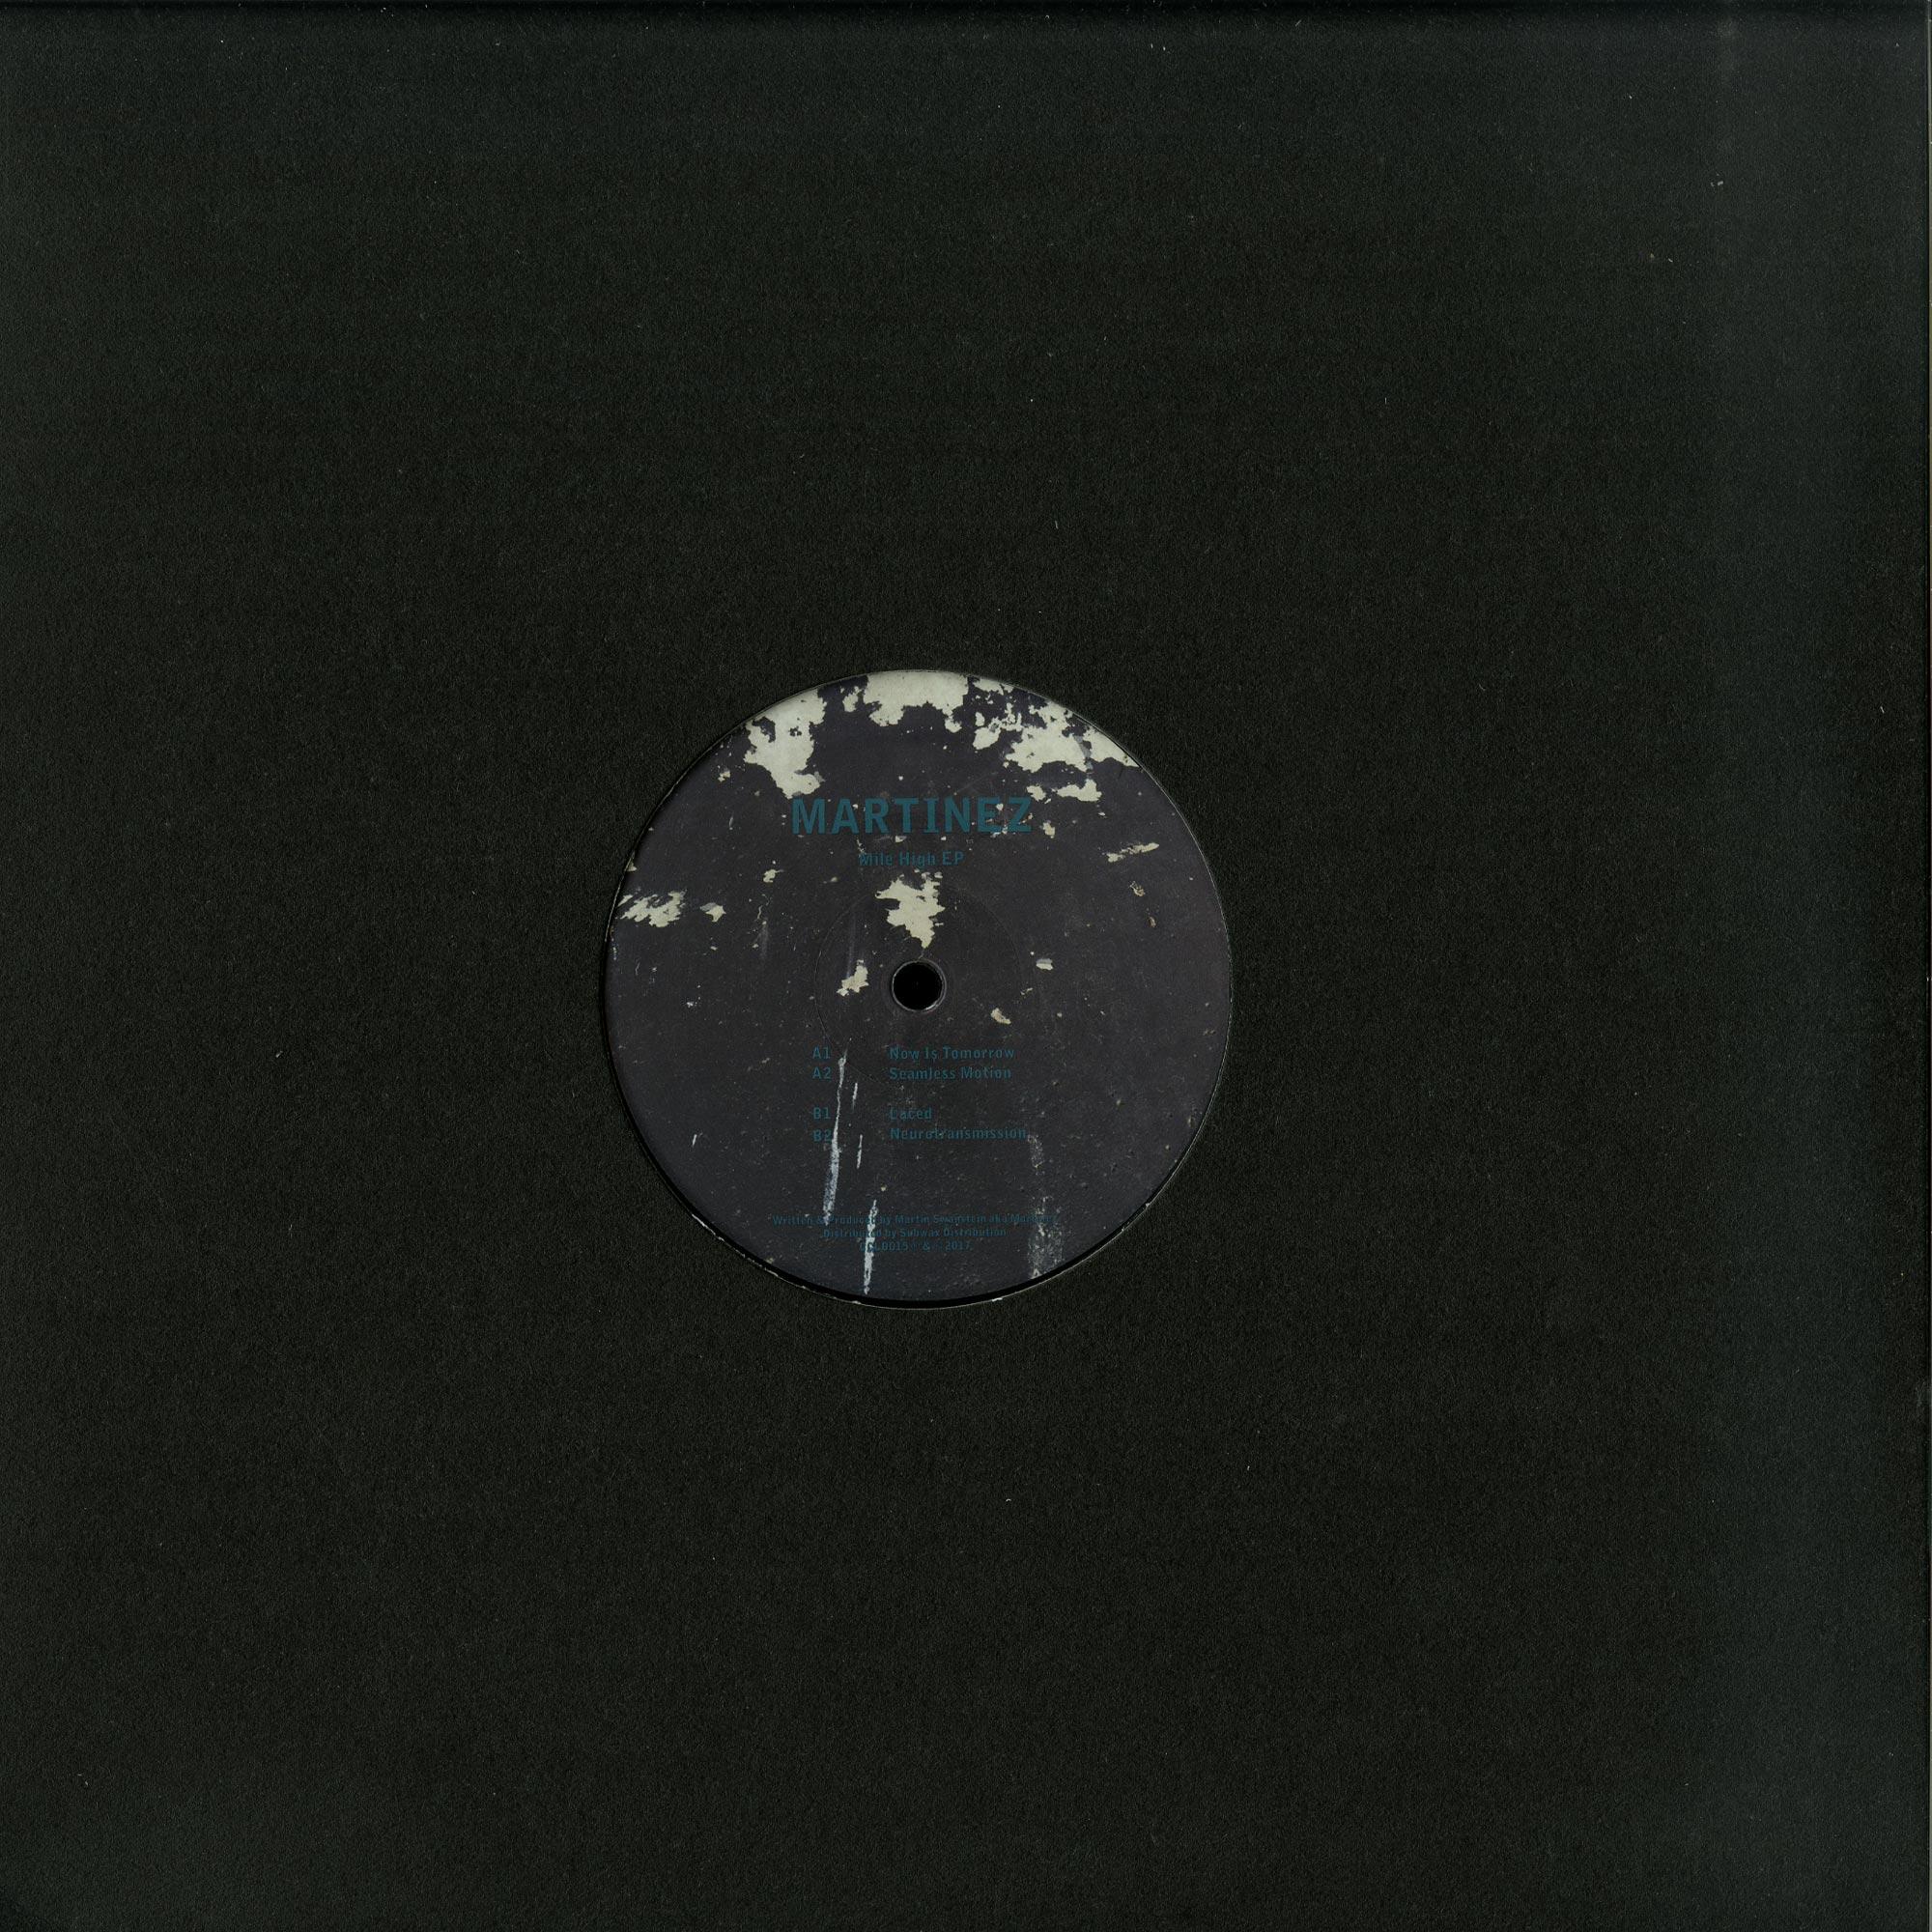 Martinez - MILE HIGH EP